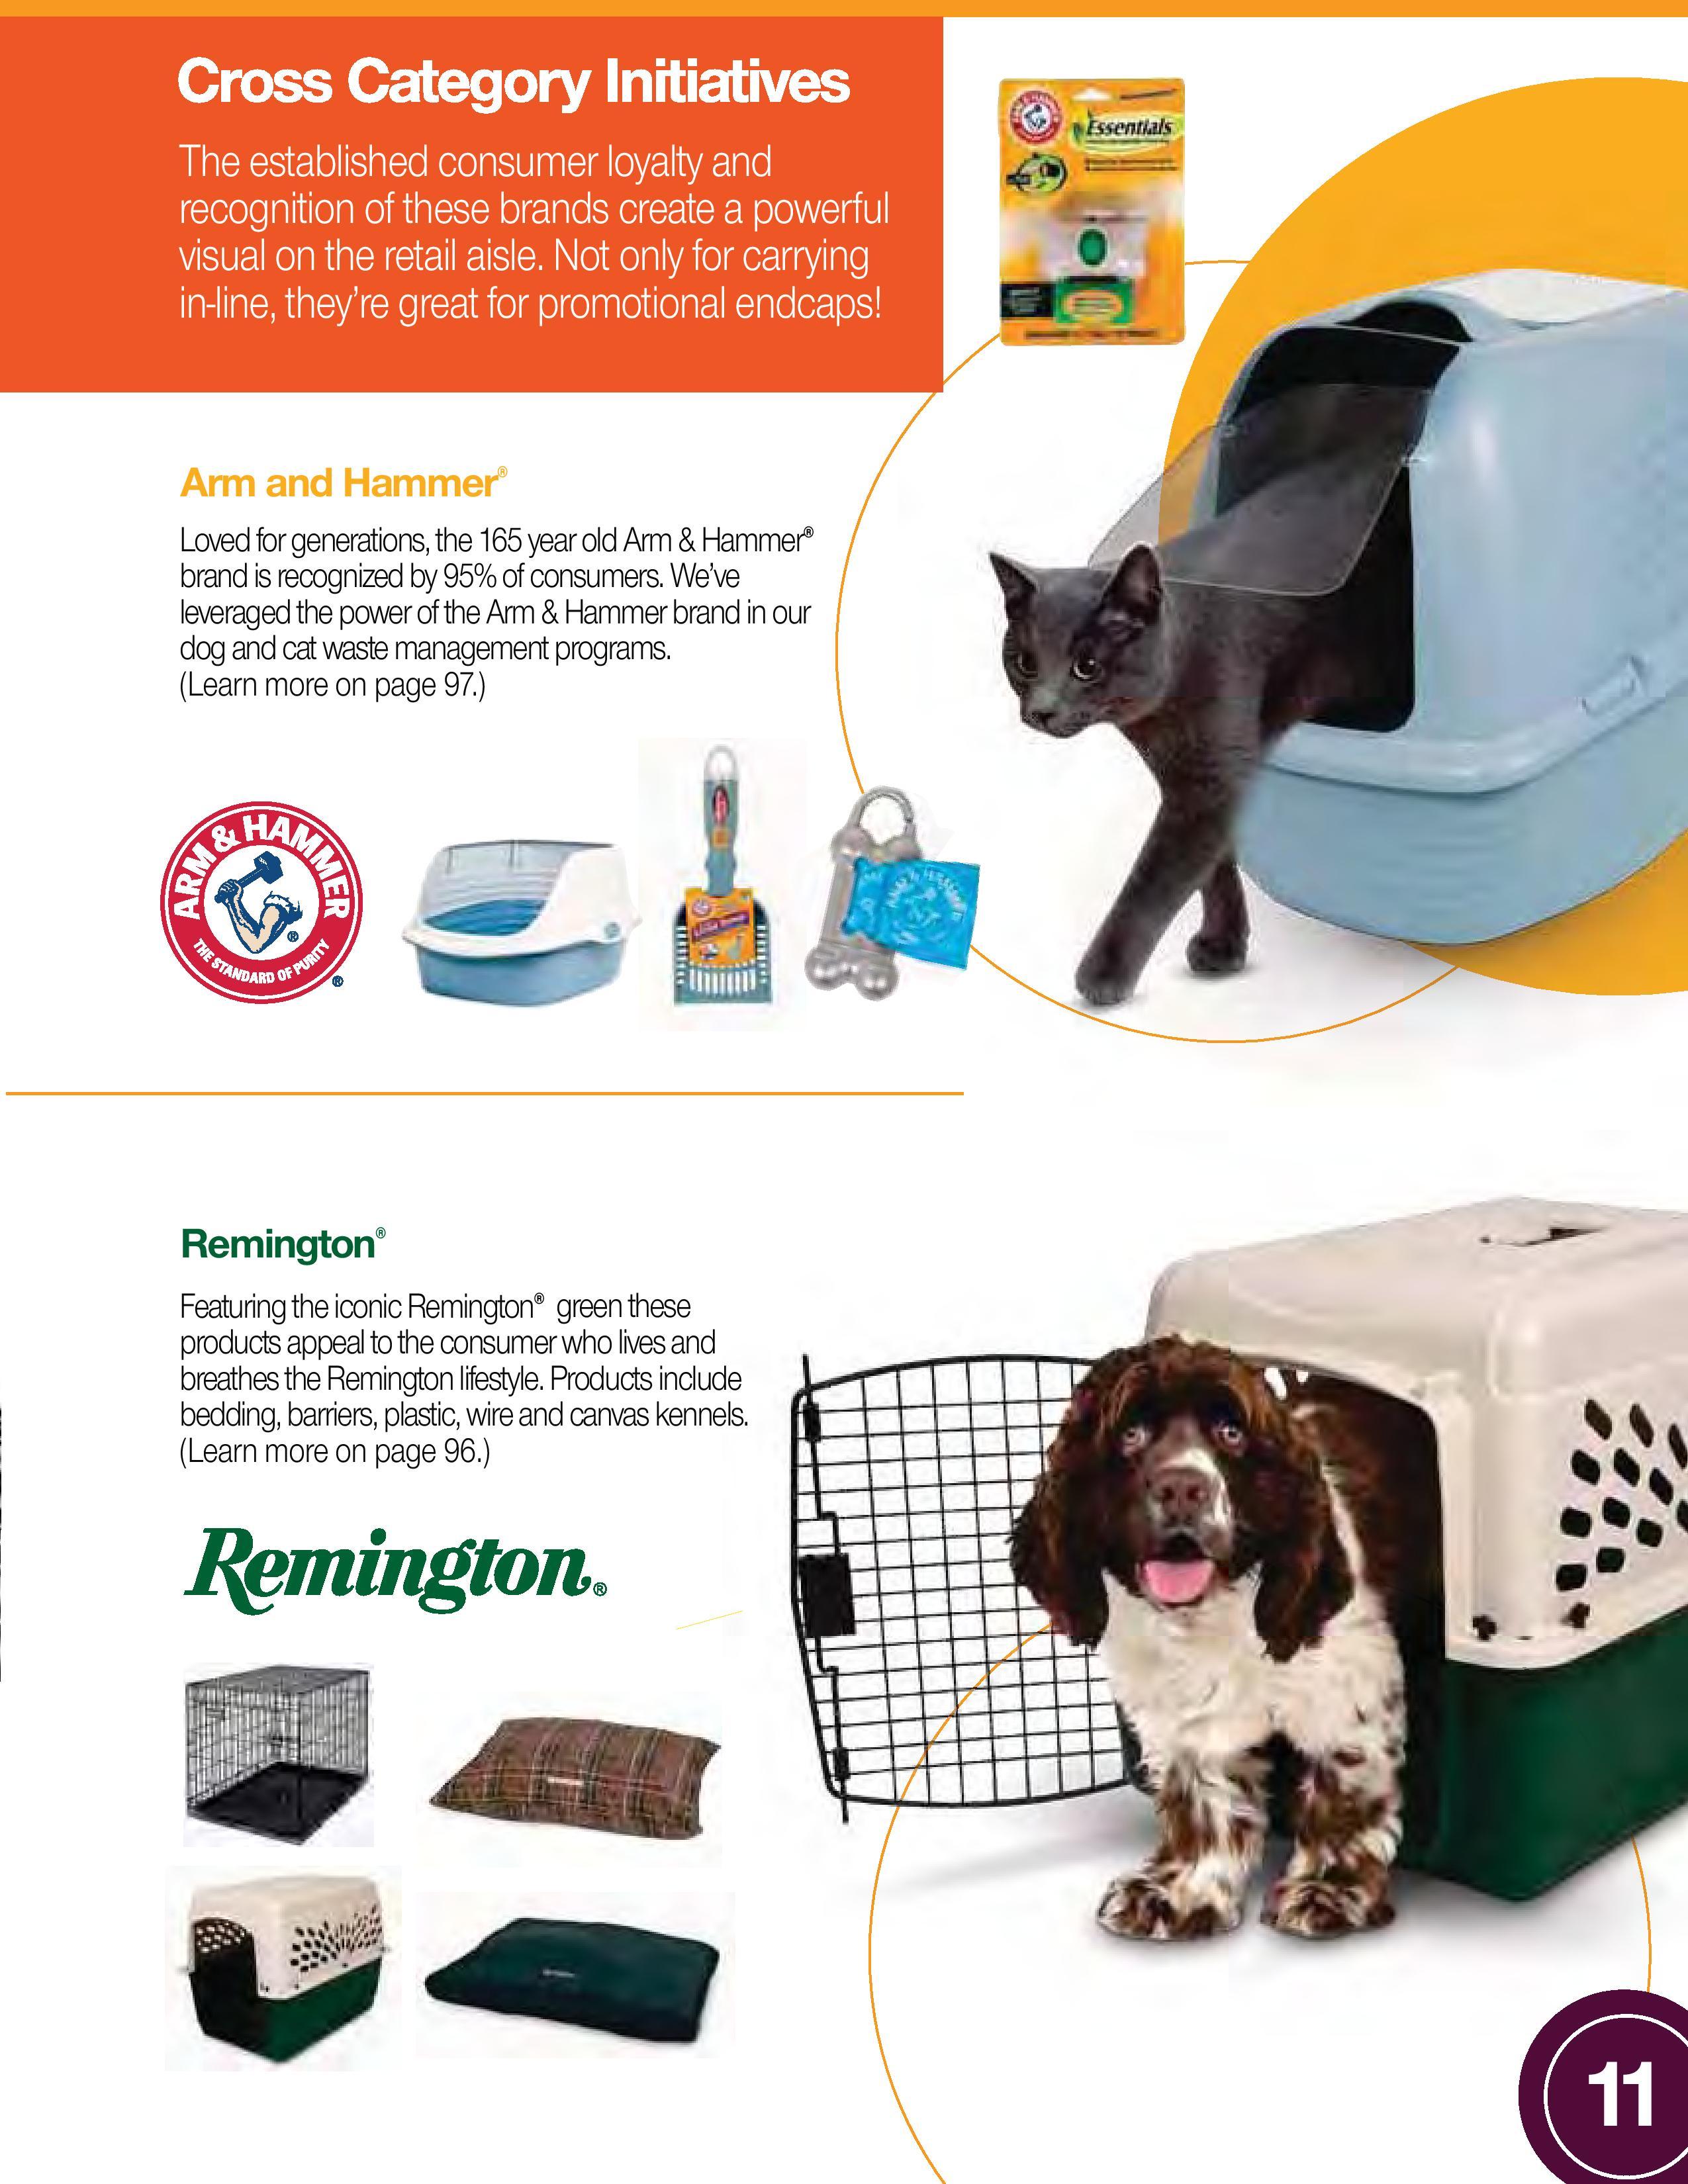 Emirtaes Animals Export 1 (11)